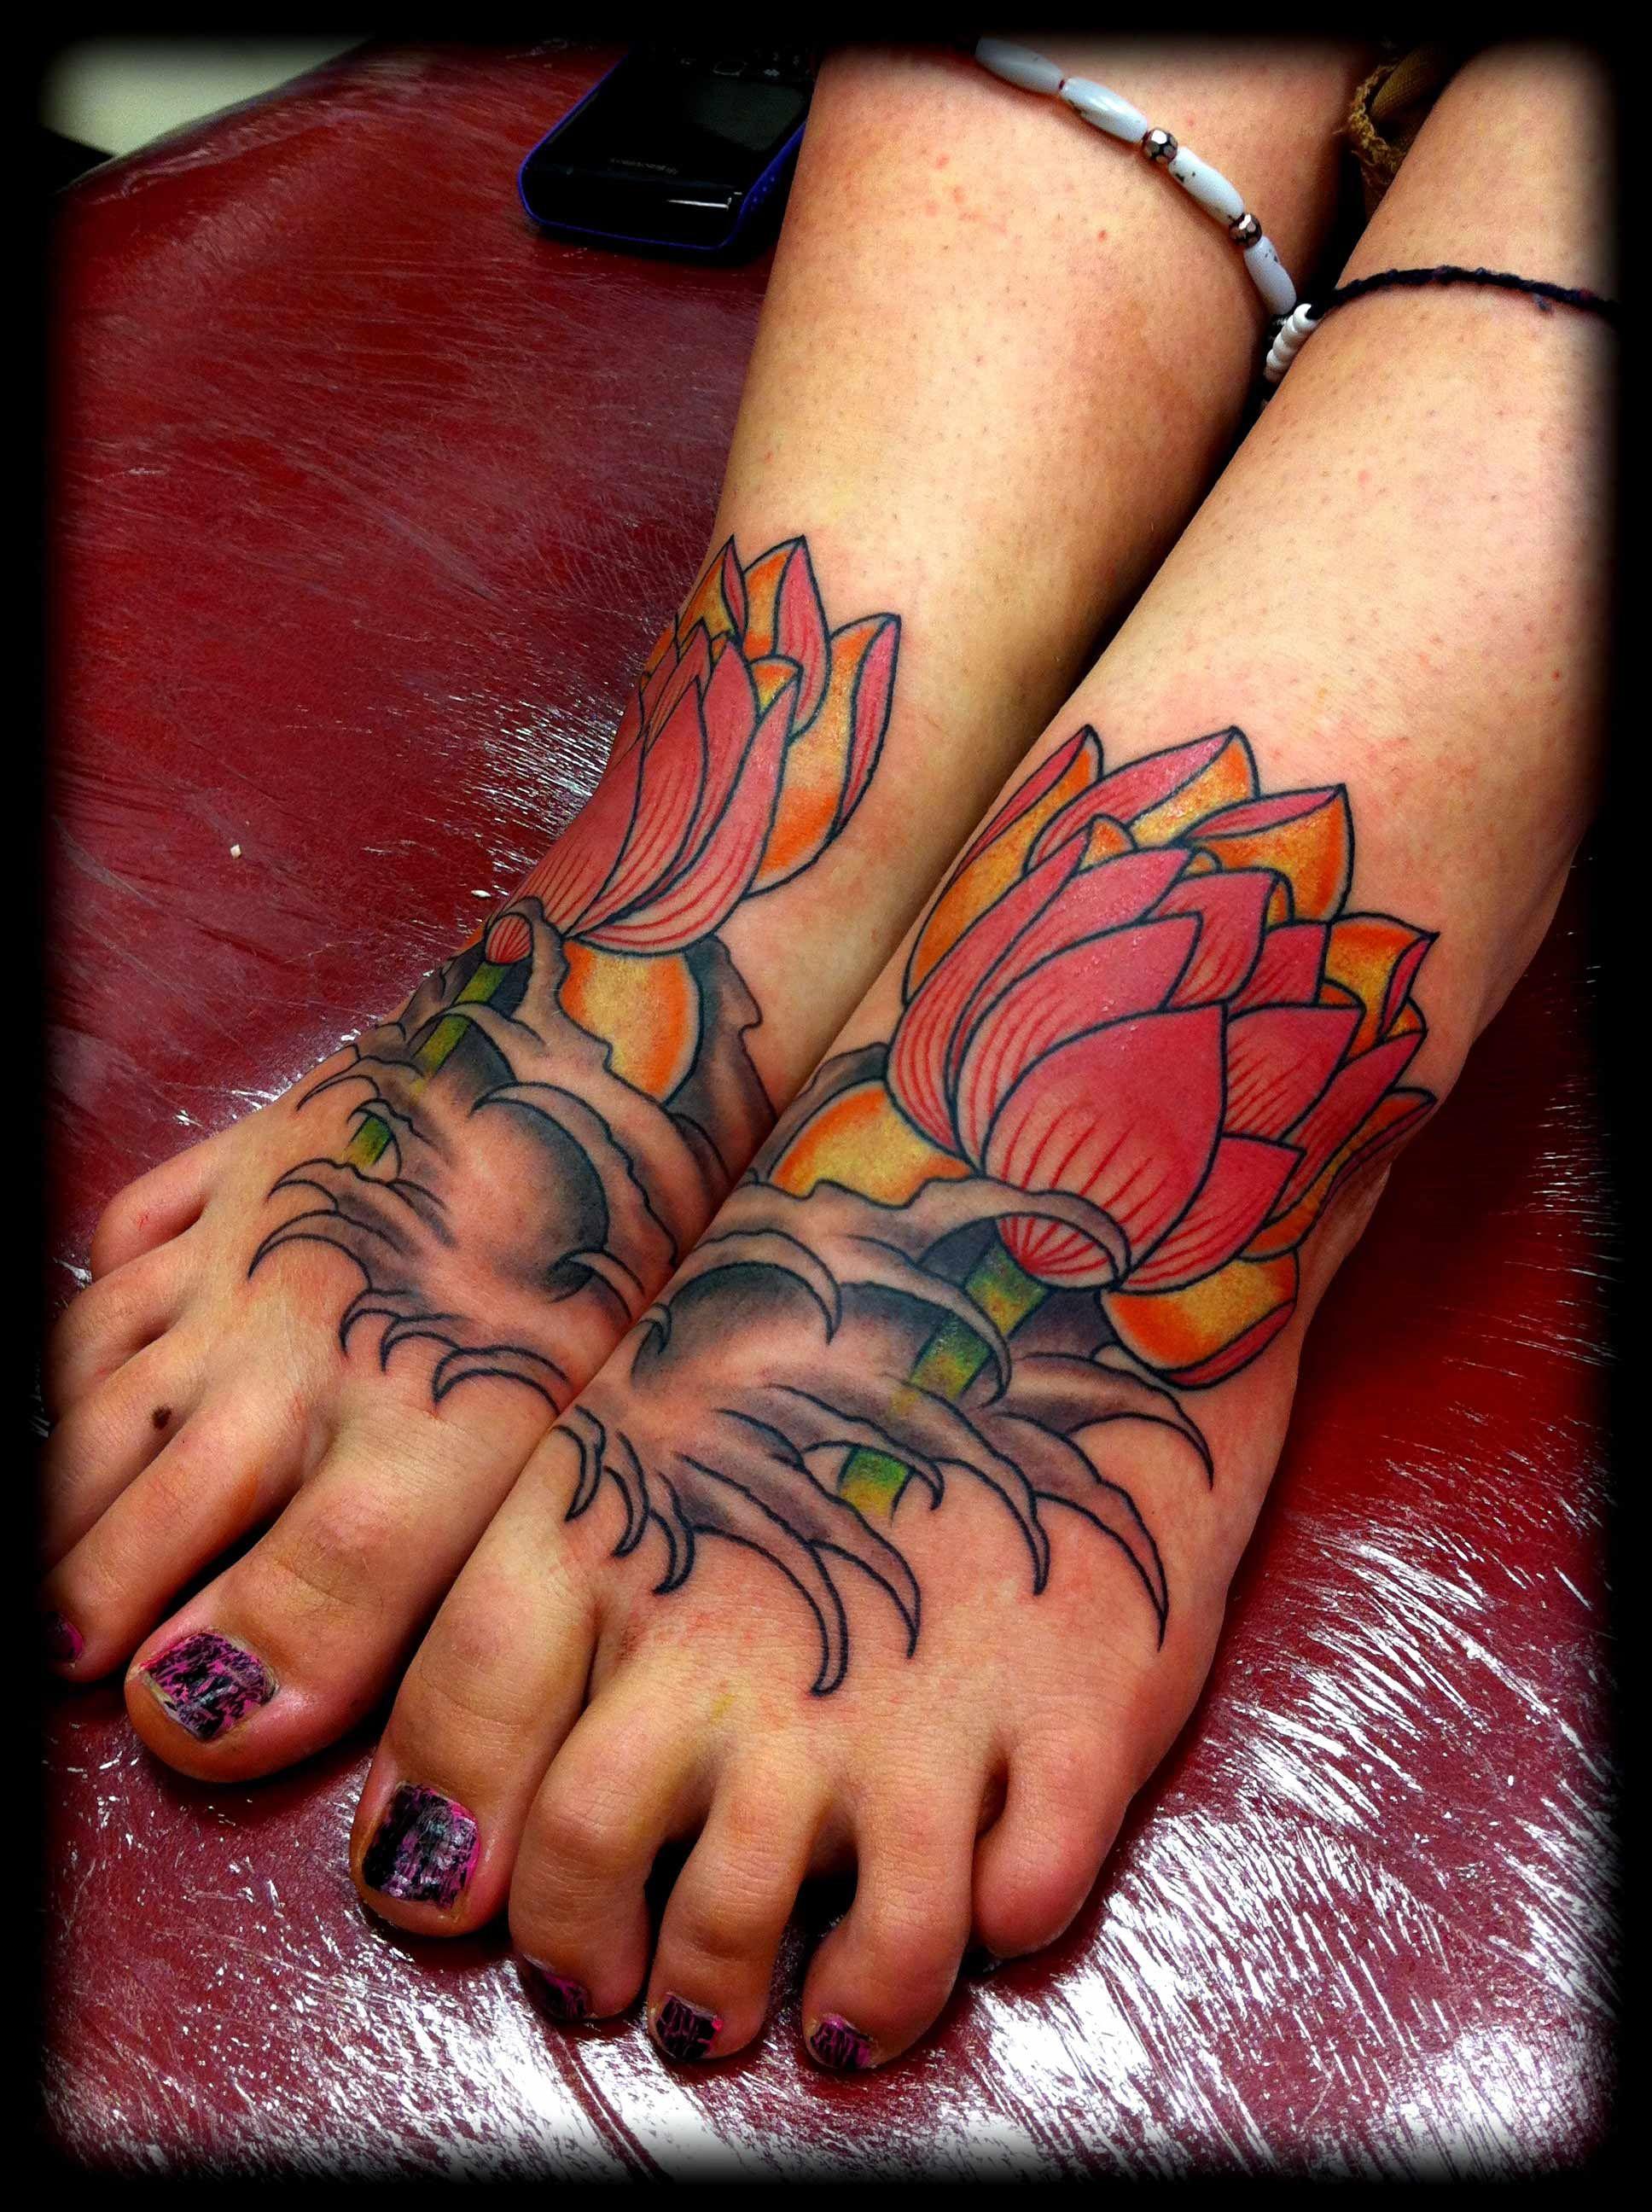 Lotus Flower Feet Tattoos Tattoos Body Art Pinterest Tattoos